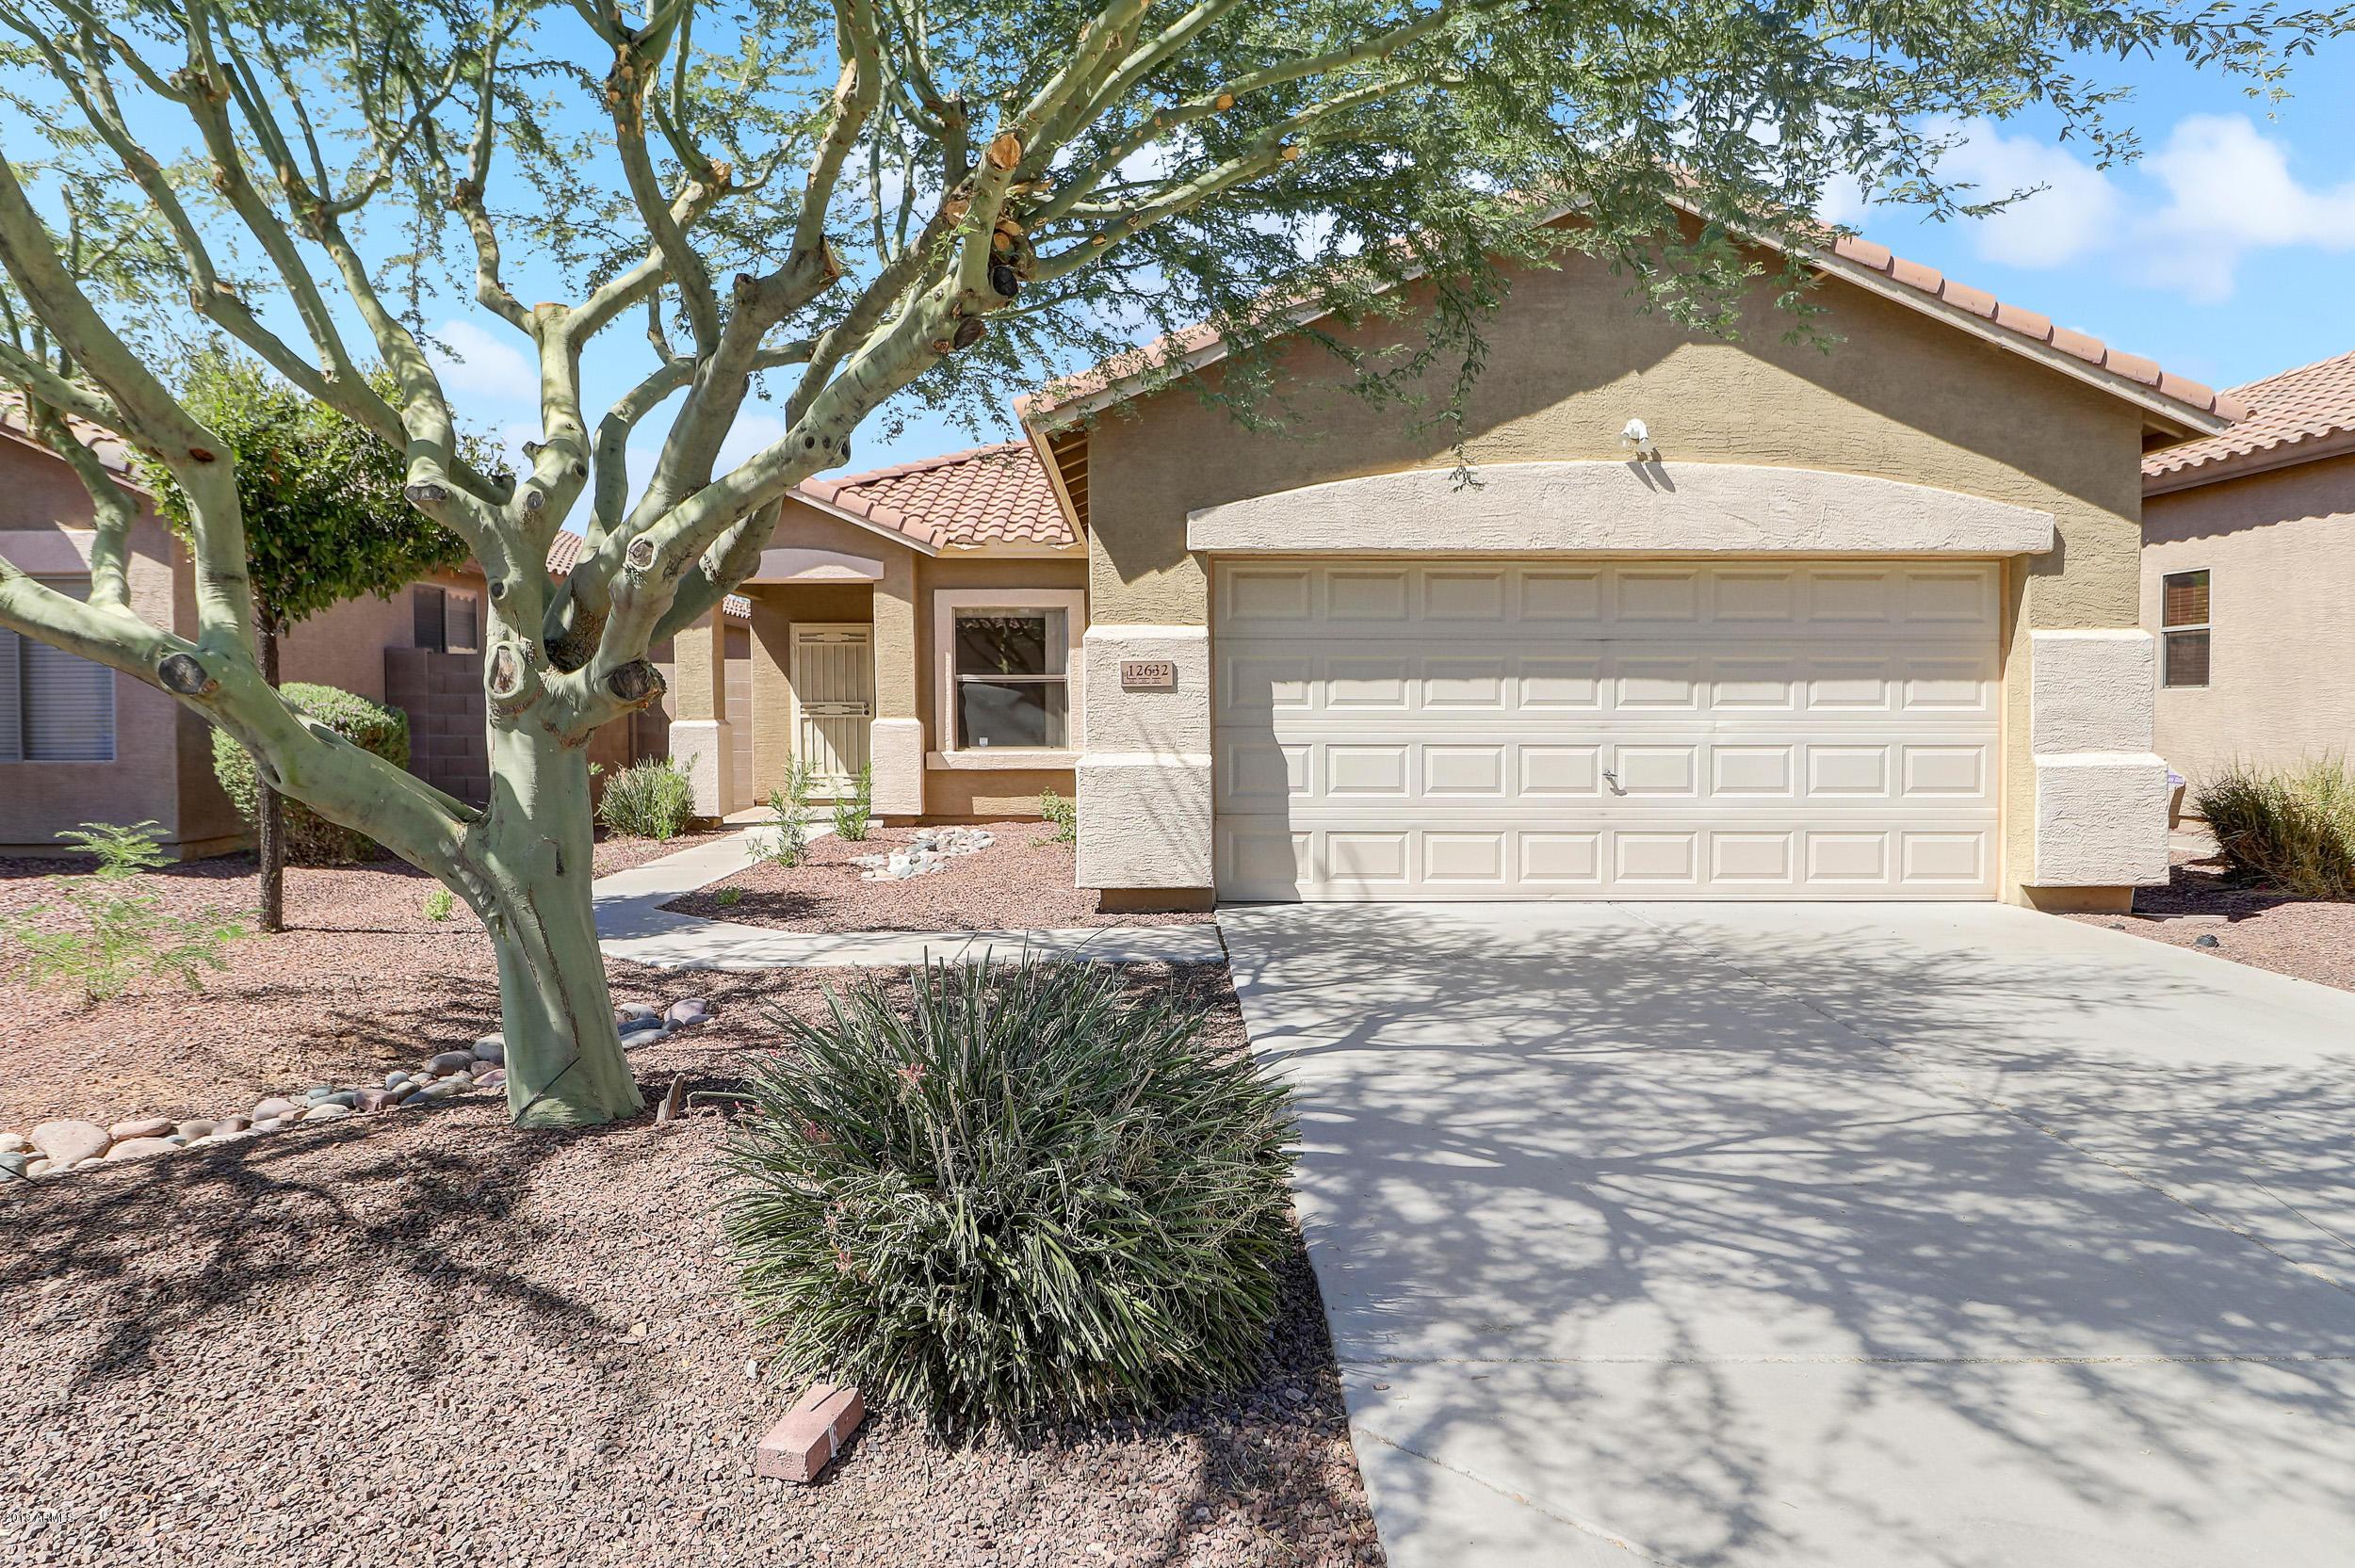 Photo of 12632 W CAMPINA Drive, Litchfield Park, AZ 85340